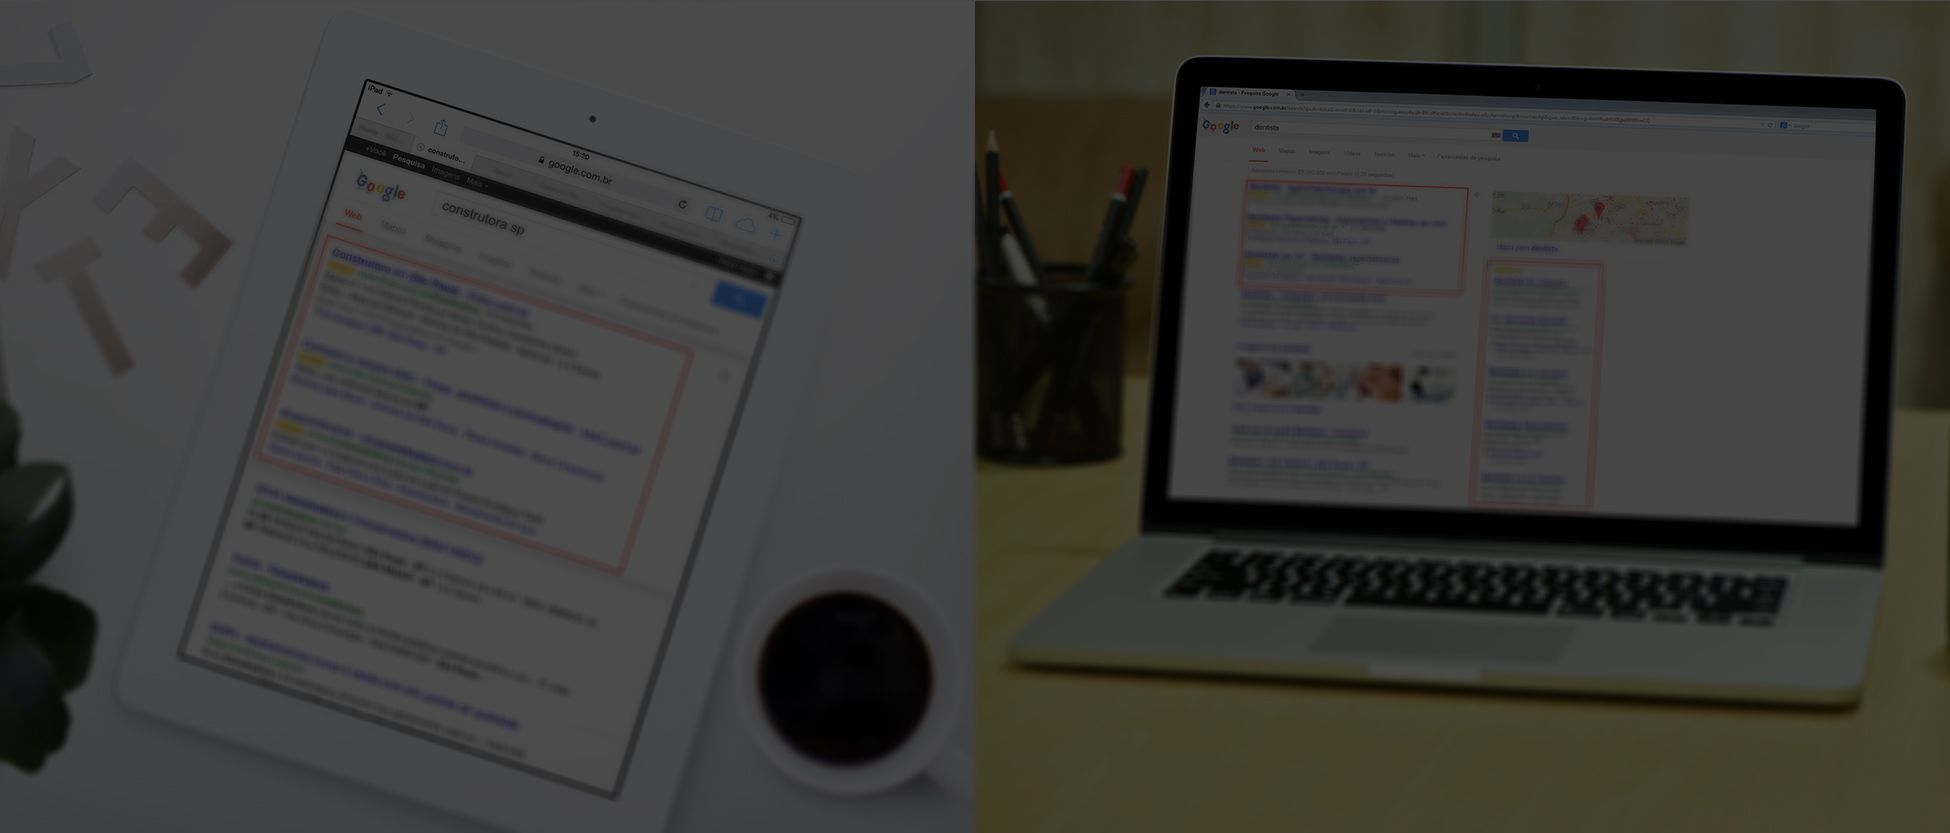 google-adwords-campanha-link-patrocinado-cabeca-criativa-comunicacao-agencia-de-publicidade